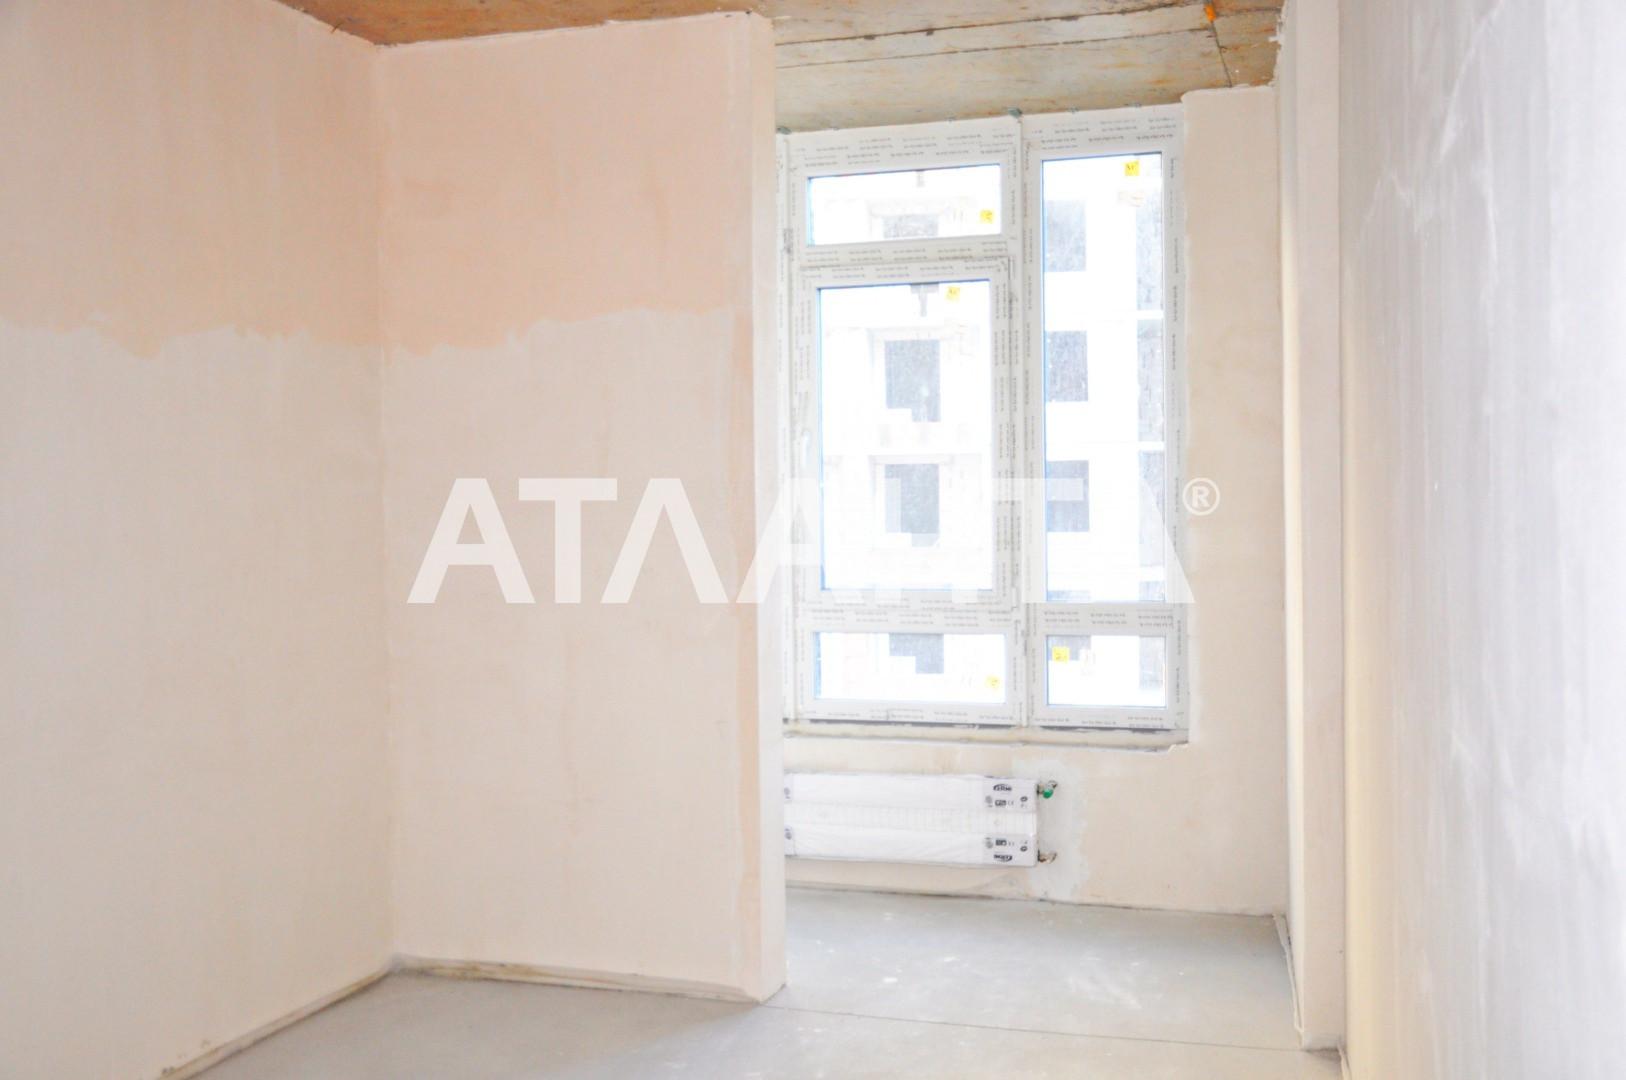 Продается 2-комнатная Квартира на ул. Генуэзская — 68 100 у.е. (фото №2)